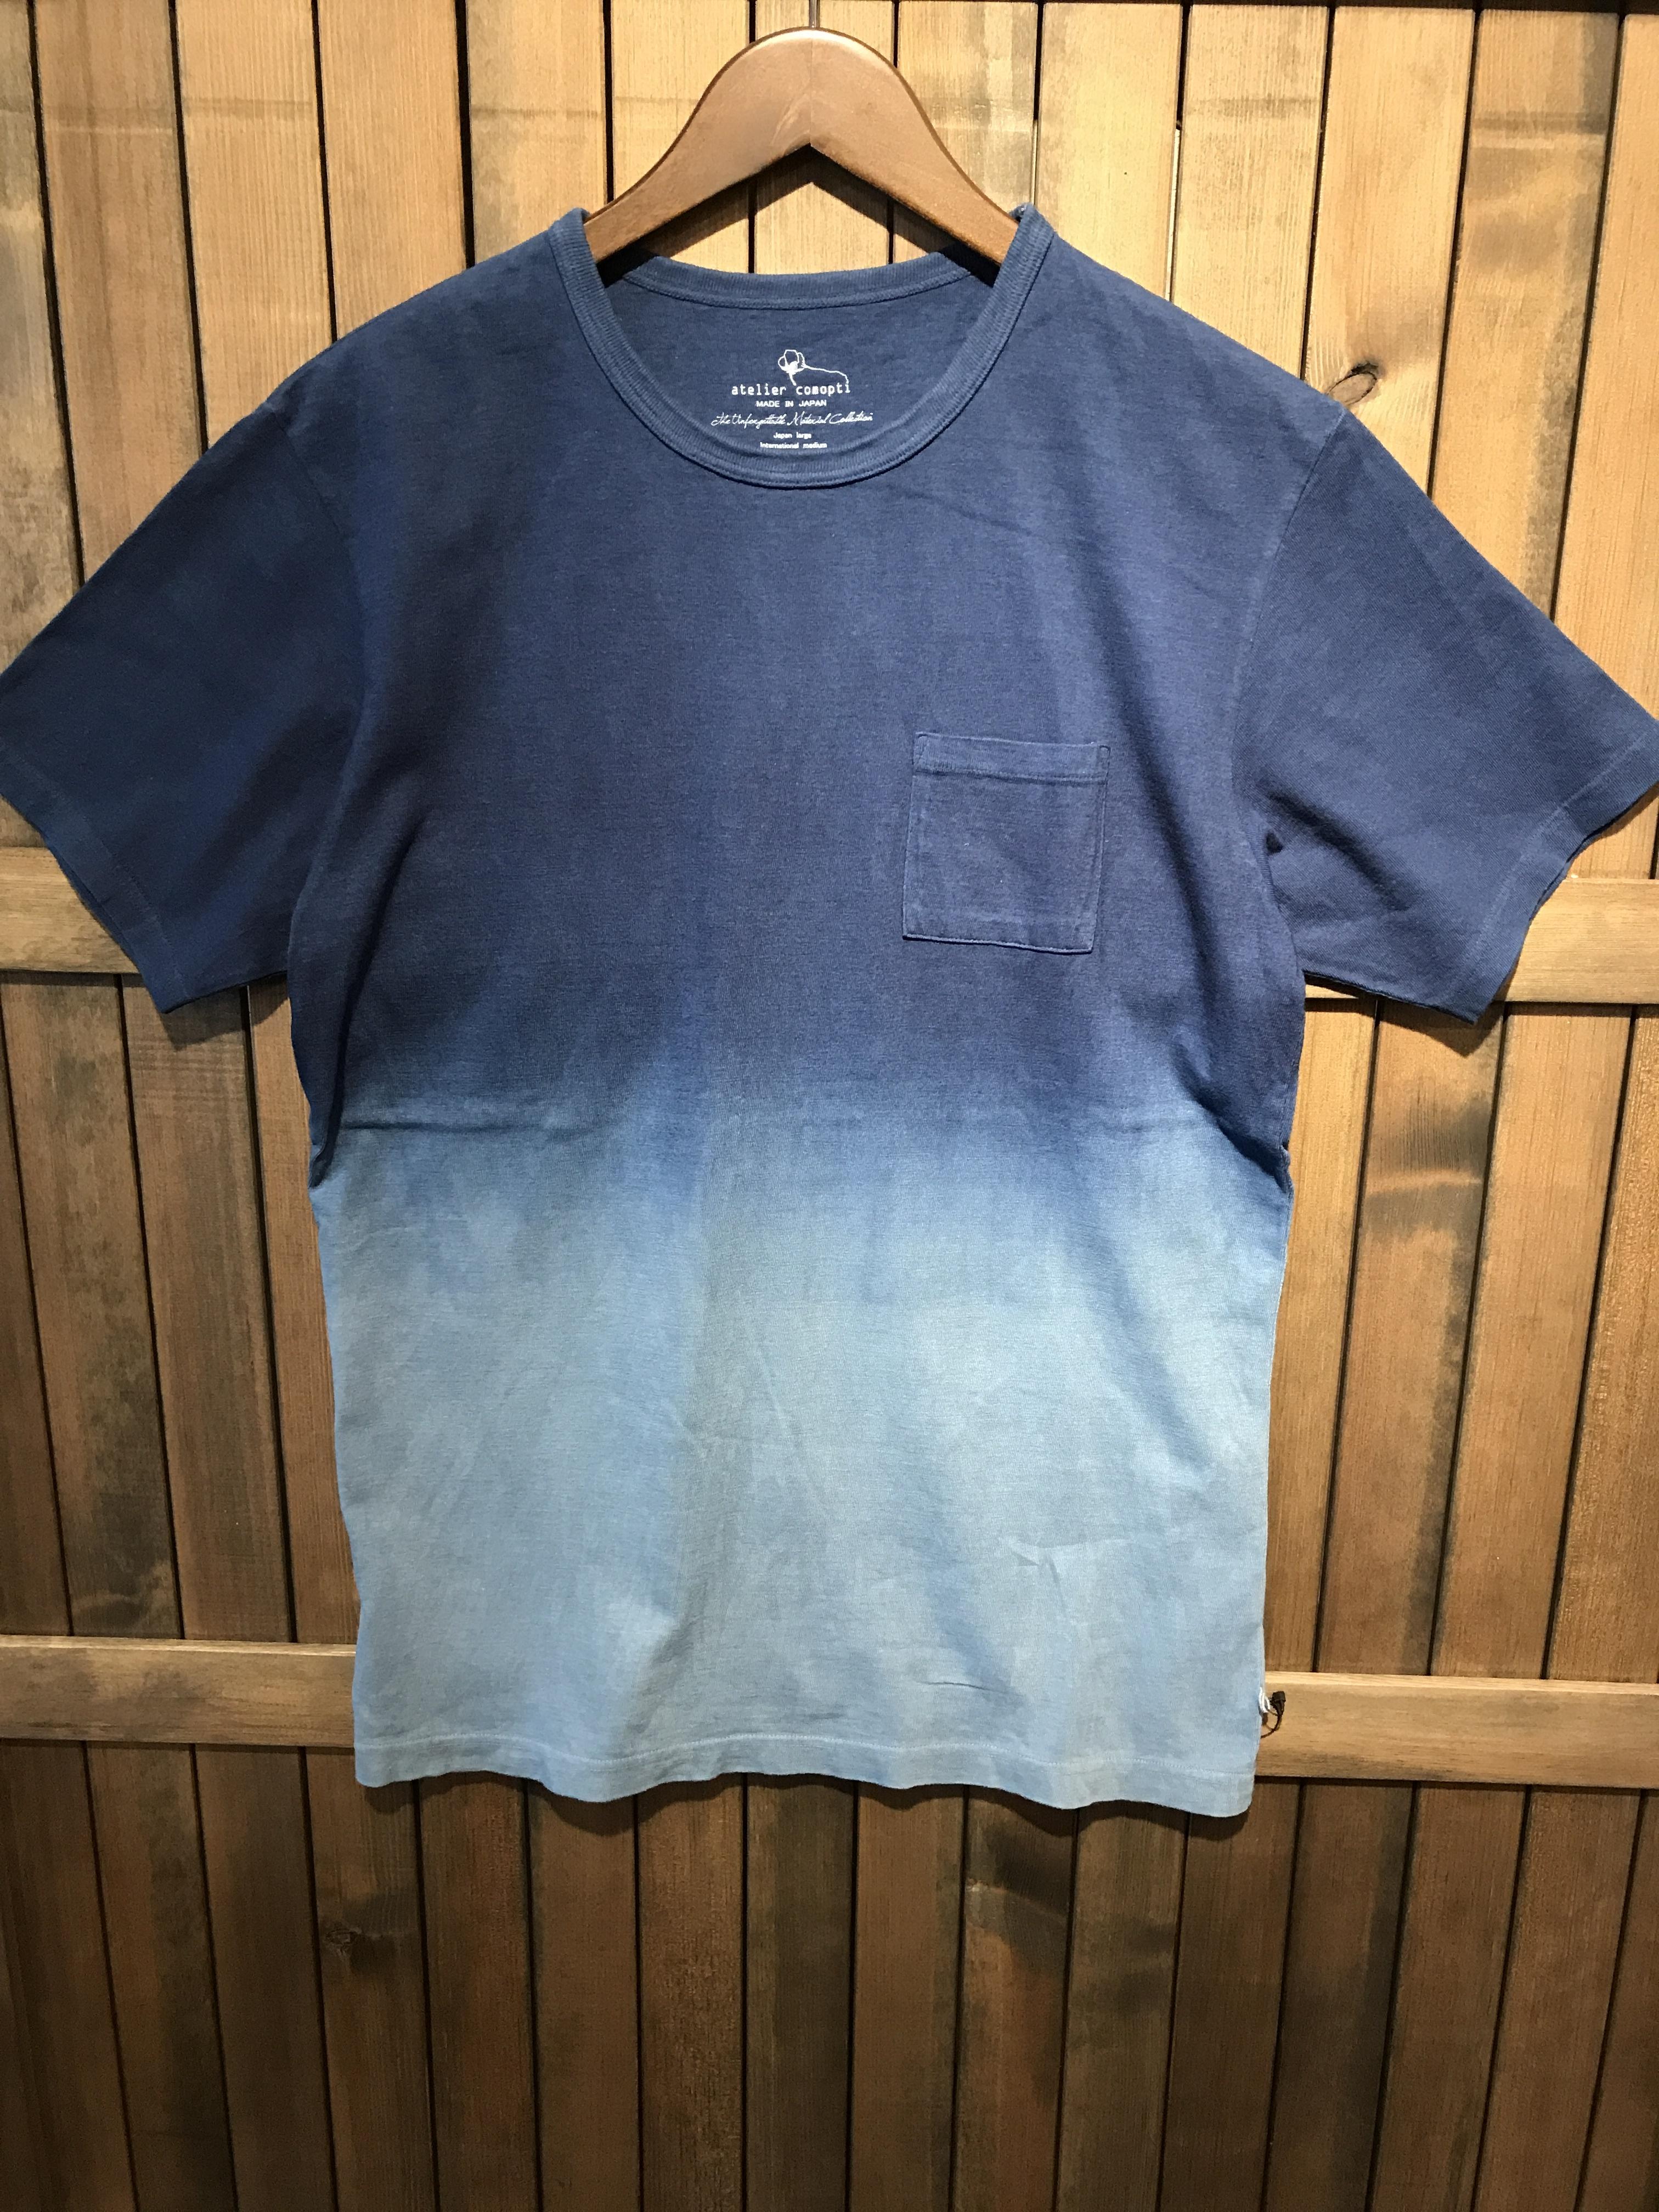 atelier comopti USAコットン16/-吊り編み天竺×自然建て琉球藍染めポケットTシャツ AISORA